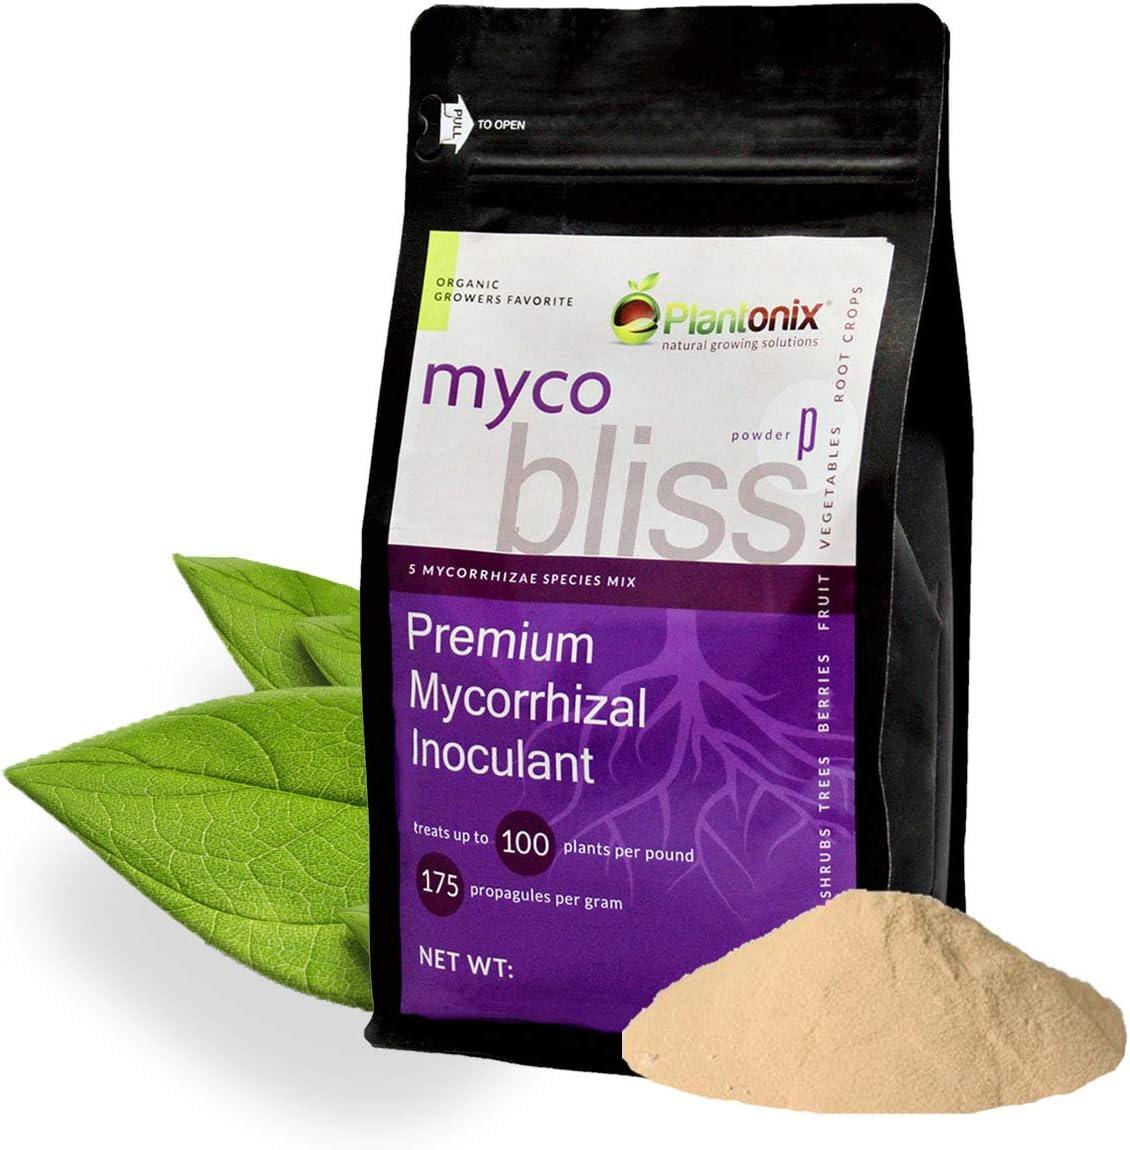 Myco Bliss Premium Mycorrhizal Fungi (5 Endo Mychorrhizae Species Mix) for Plants (Powder, 5 lb)